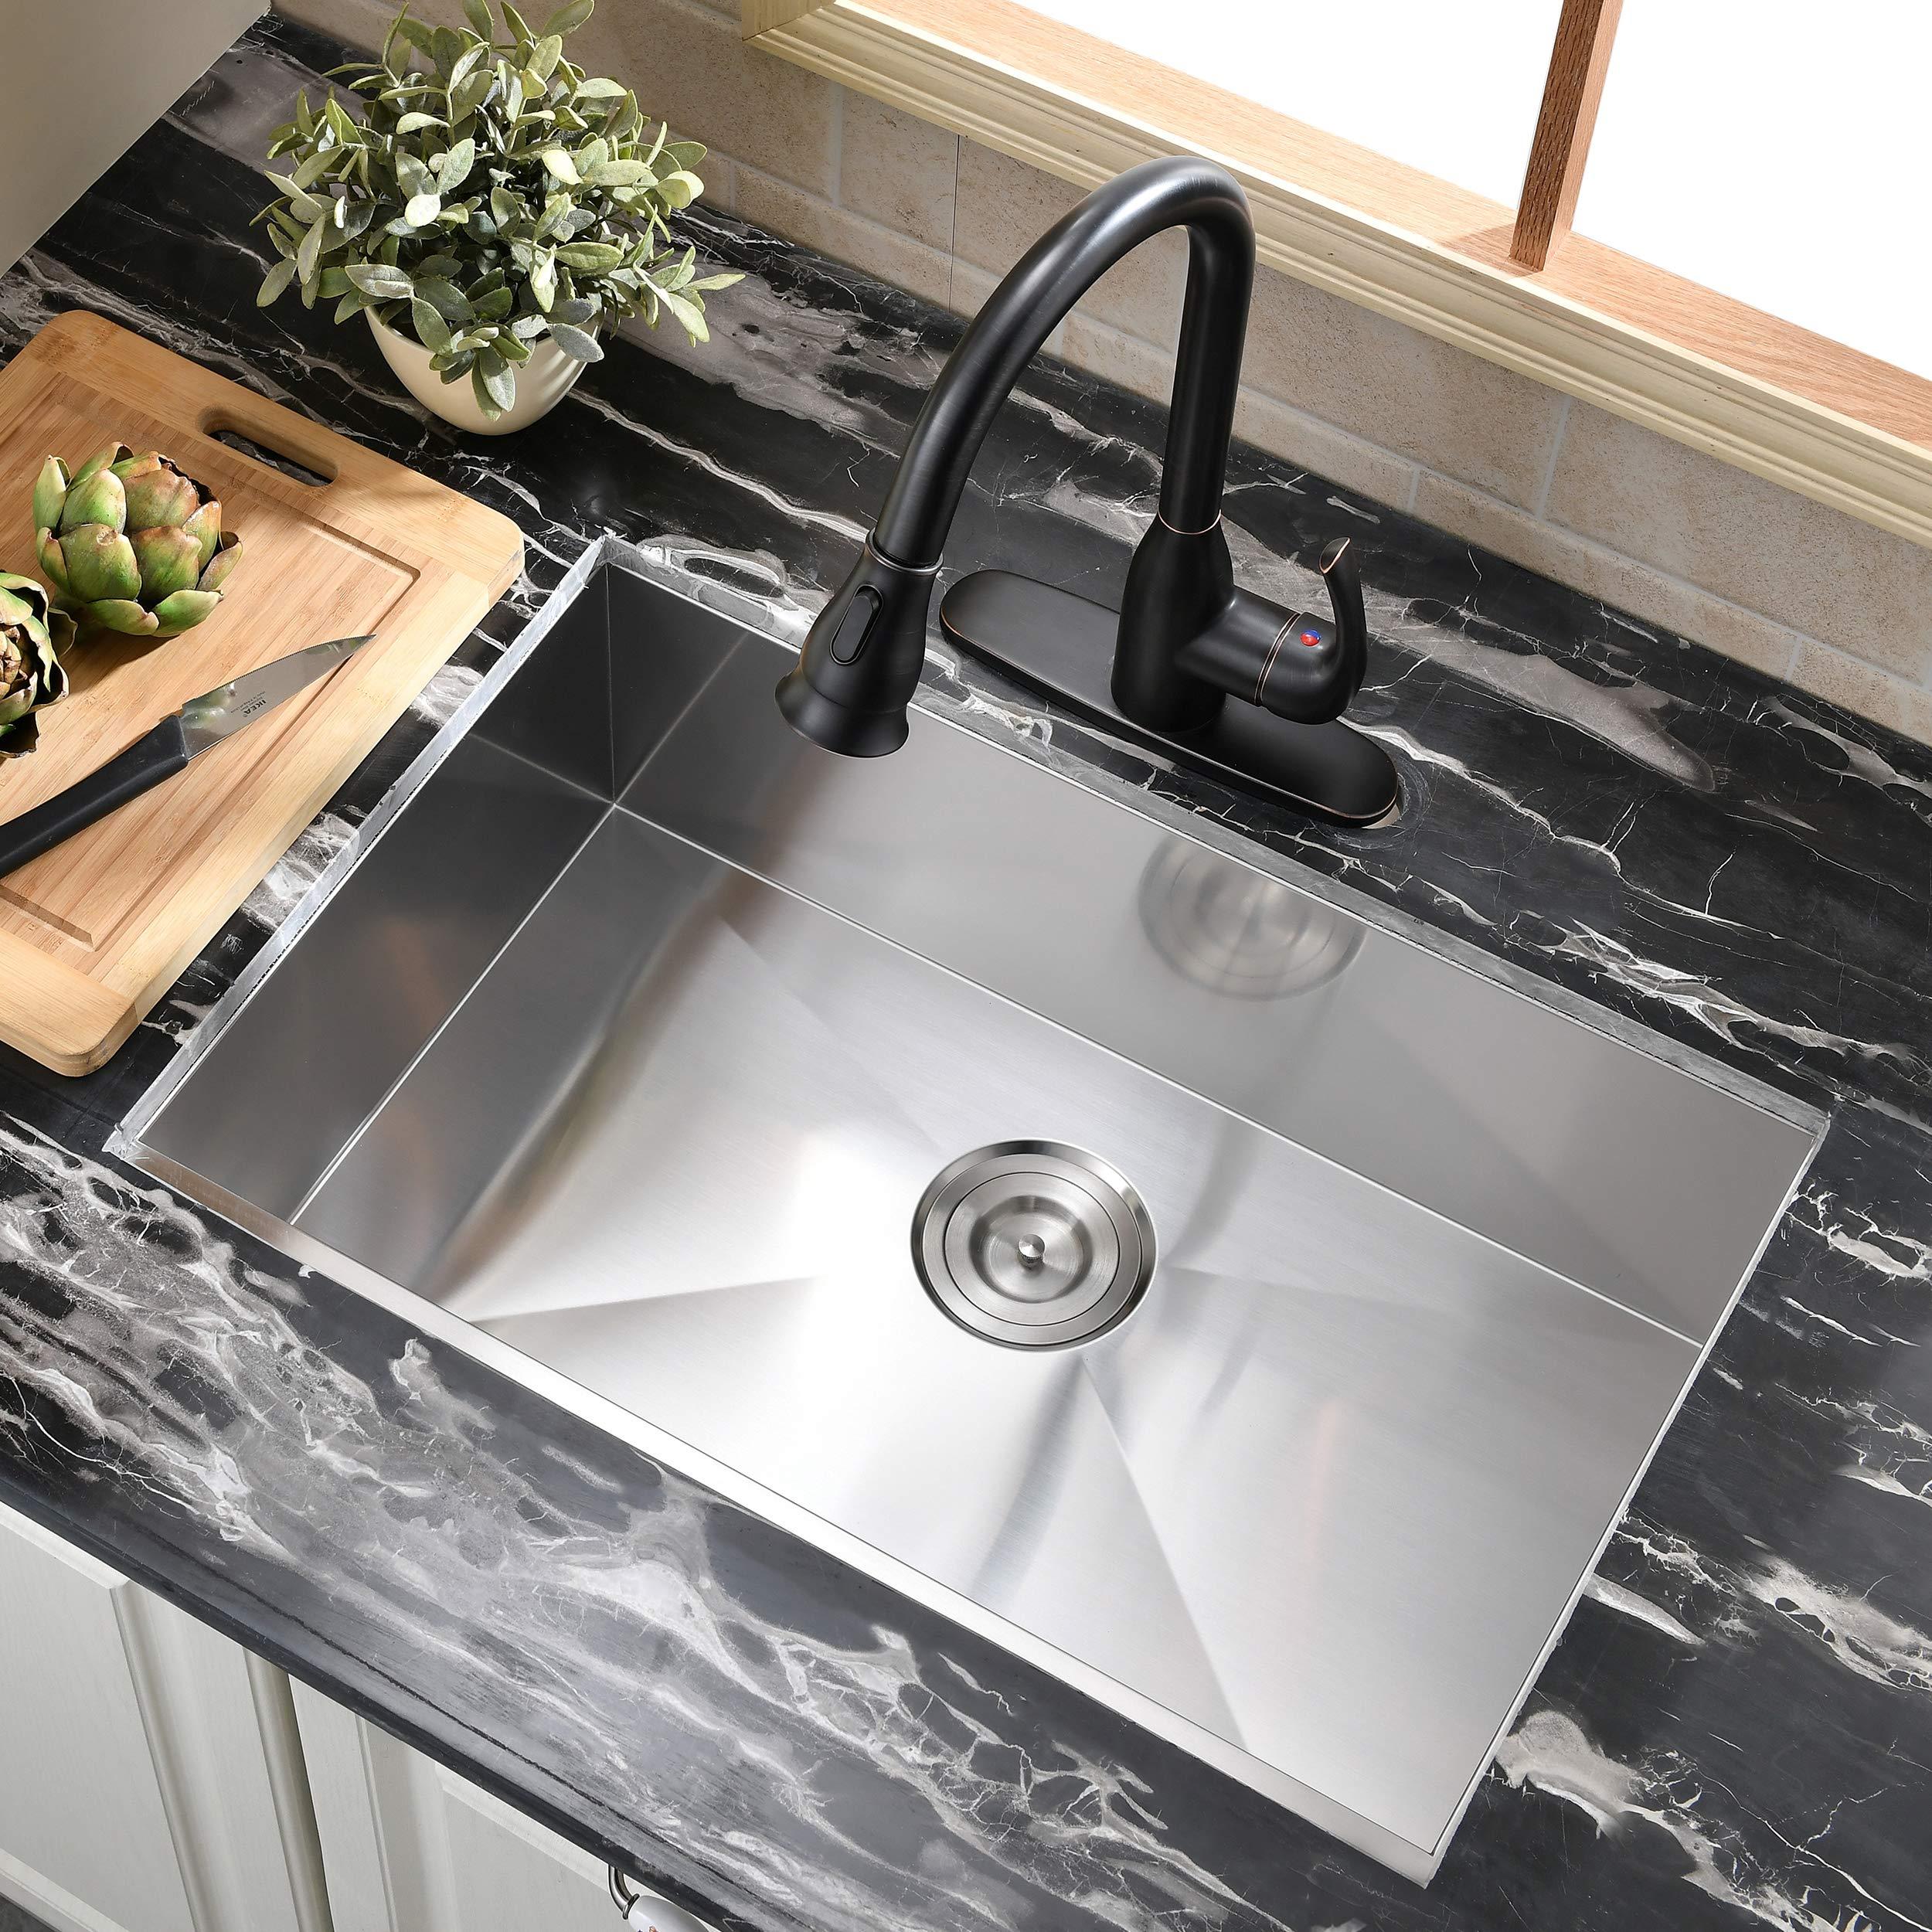 Commercial 28 Inch 16 Gauge Undermount Single Bowl Stainless Steel Kitchen Sink Buy Online In Kuwait At Desertcart